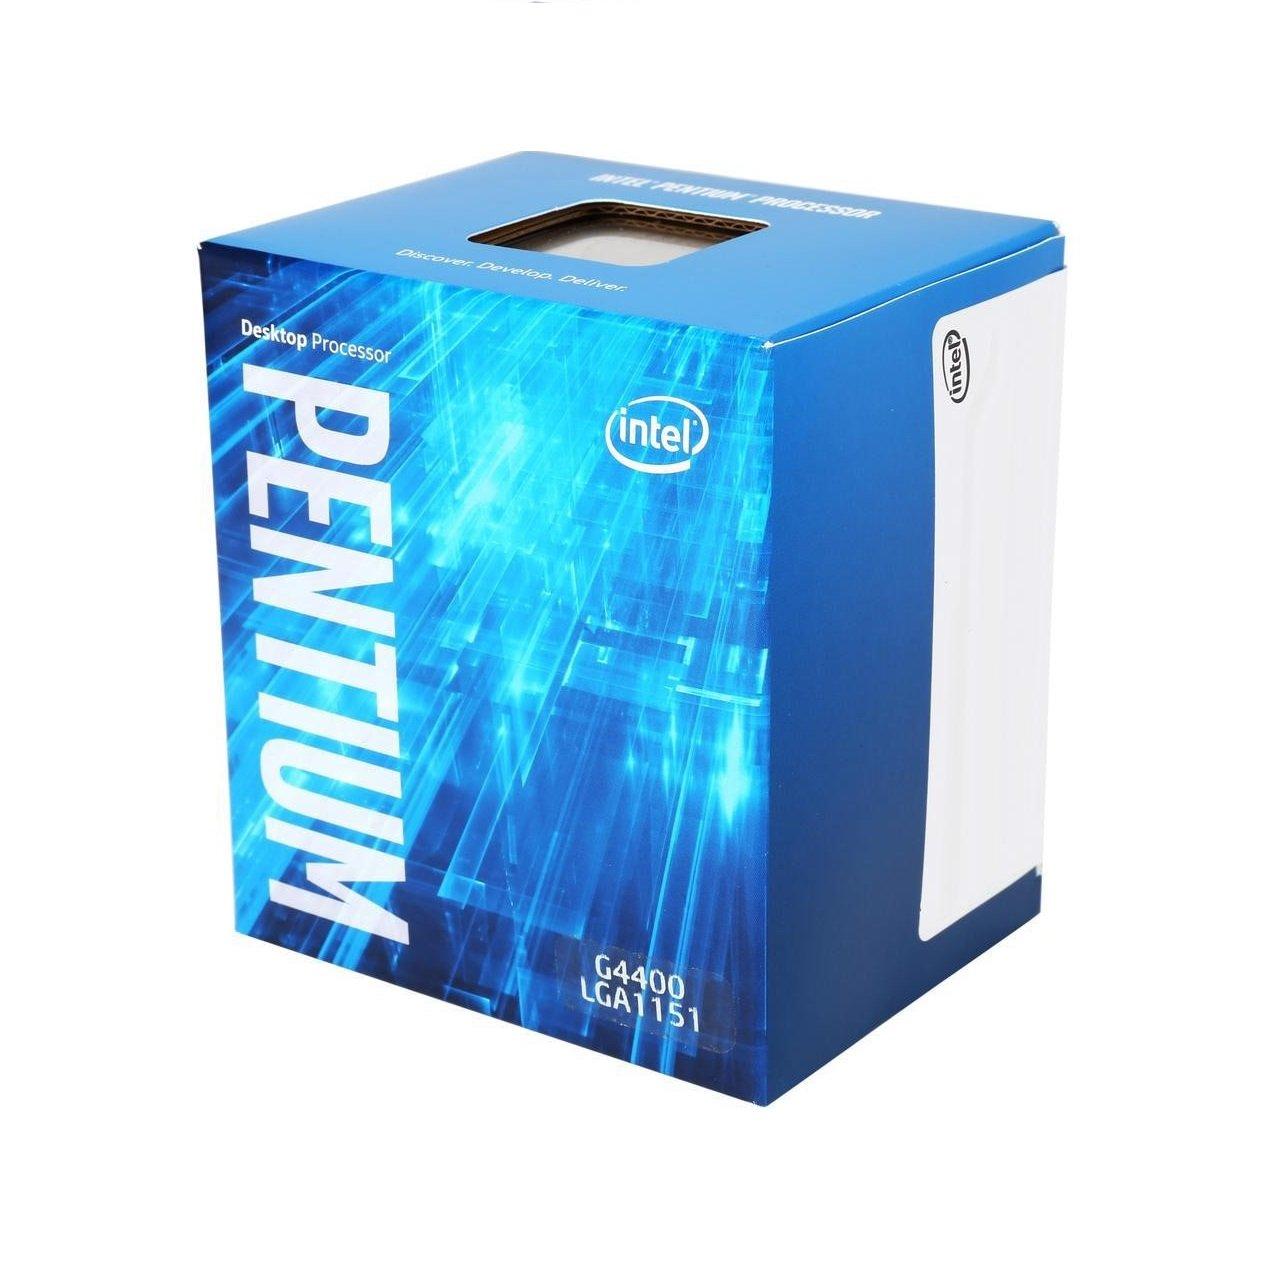 Intel BX80662G4400 Pentium Processor G4400 3.3 GHz FCLGA1151 by Intel